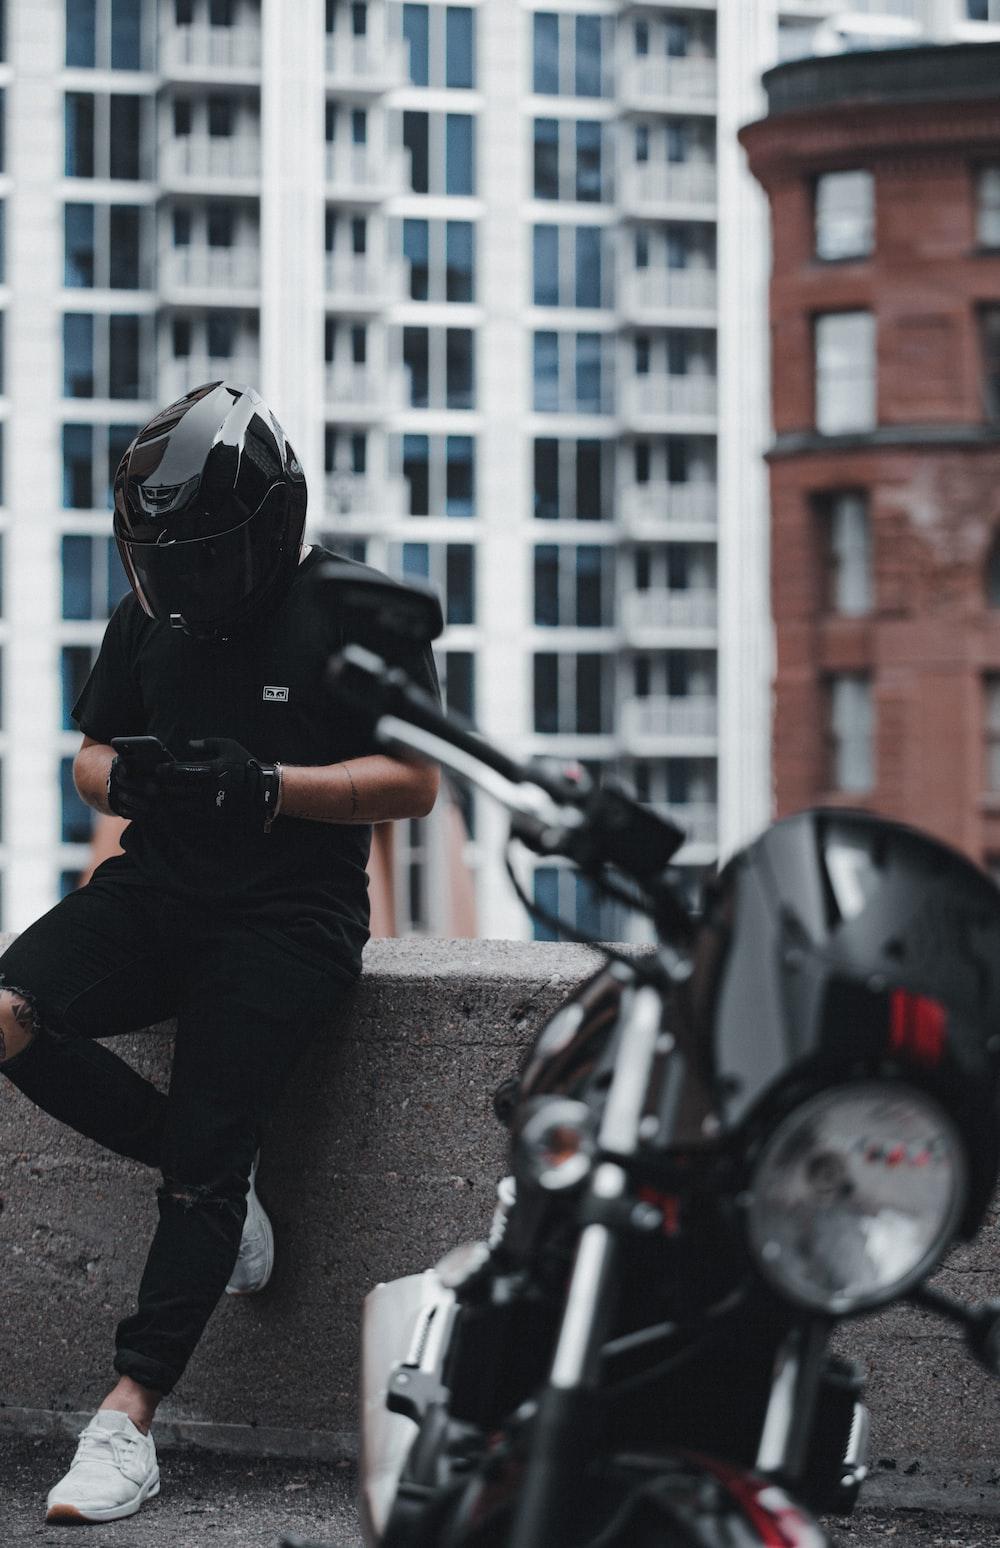 man in black jacket and gray pants wearing black helmet riding motorcycle during daytime